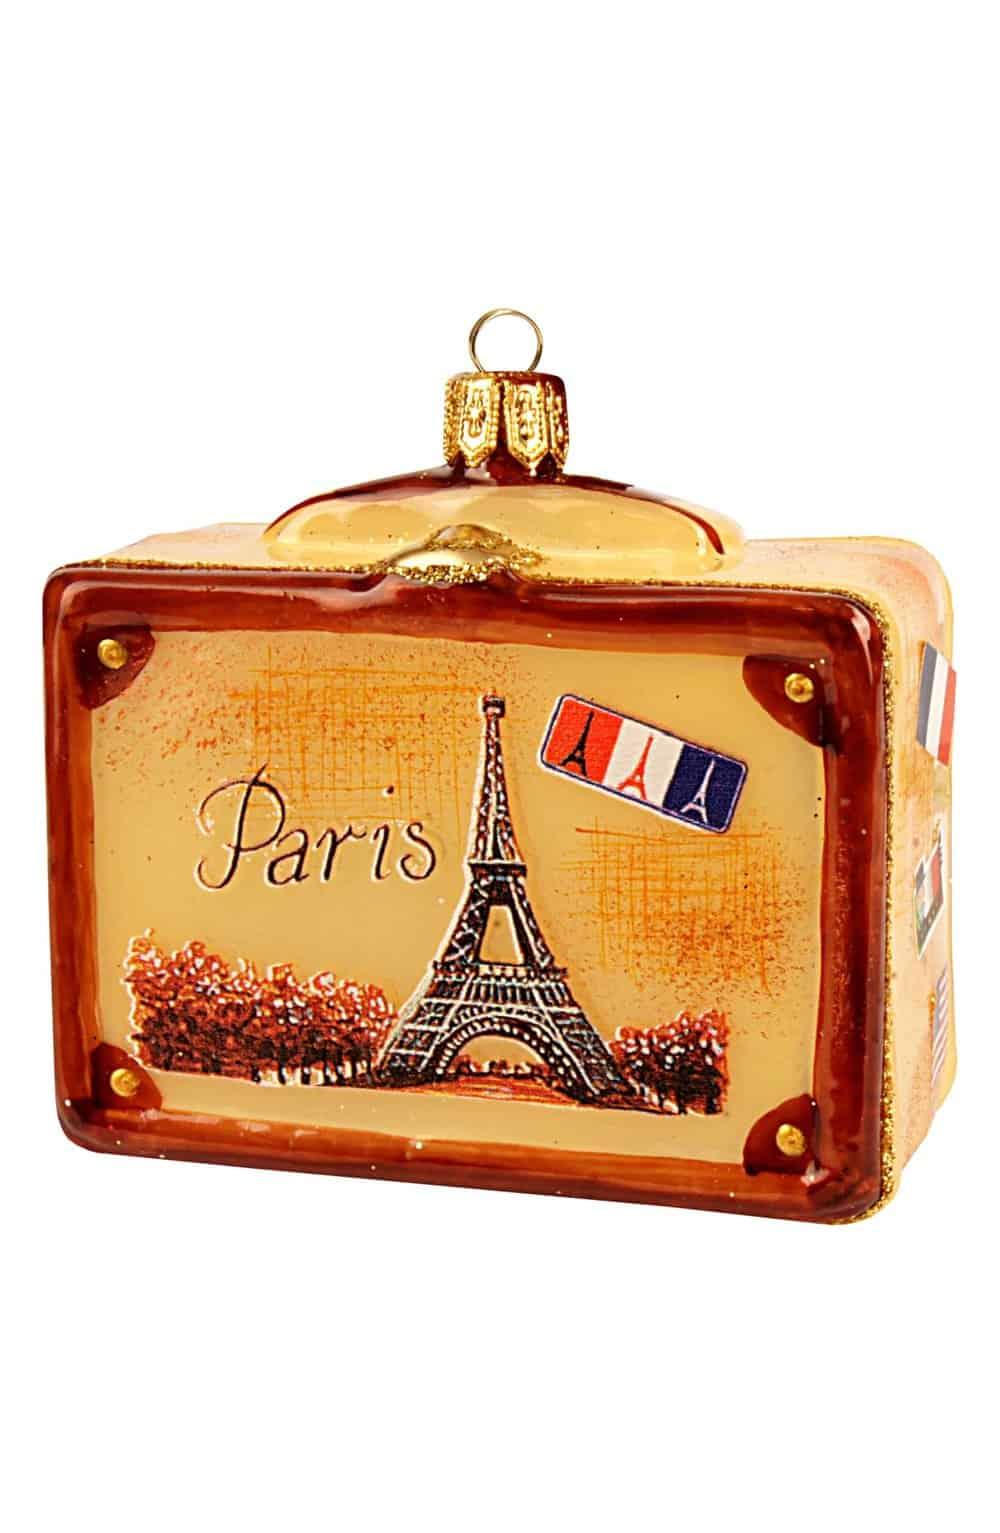 paris travel suitcase ornament